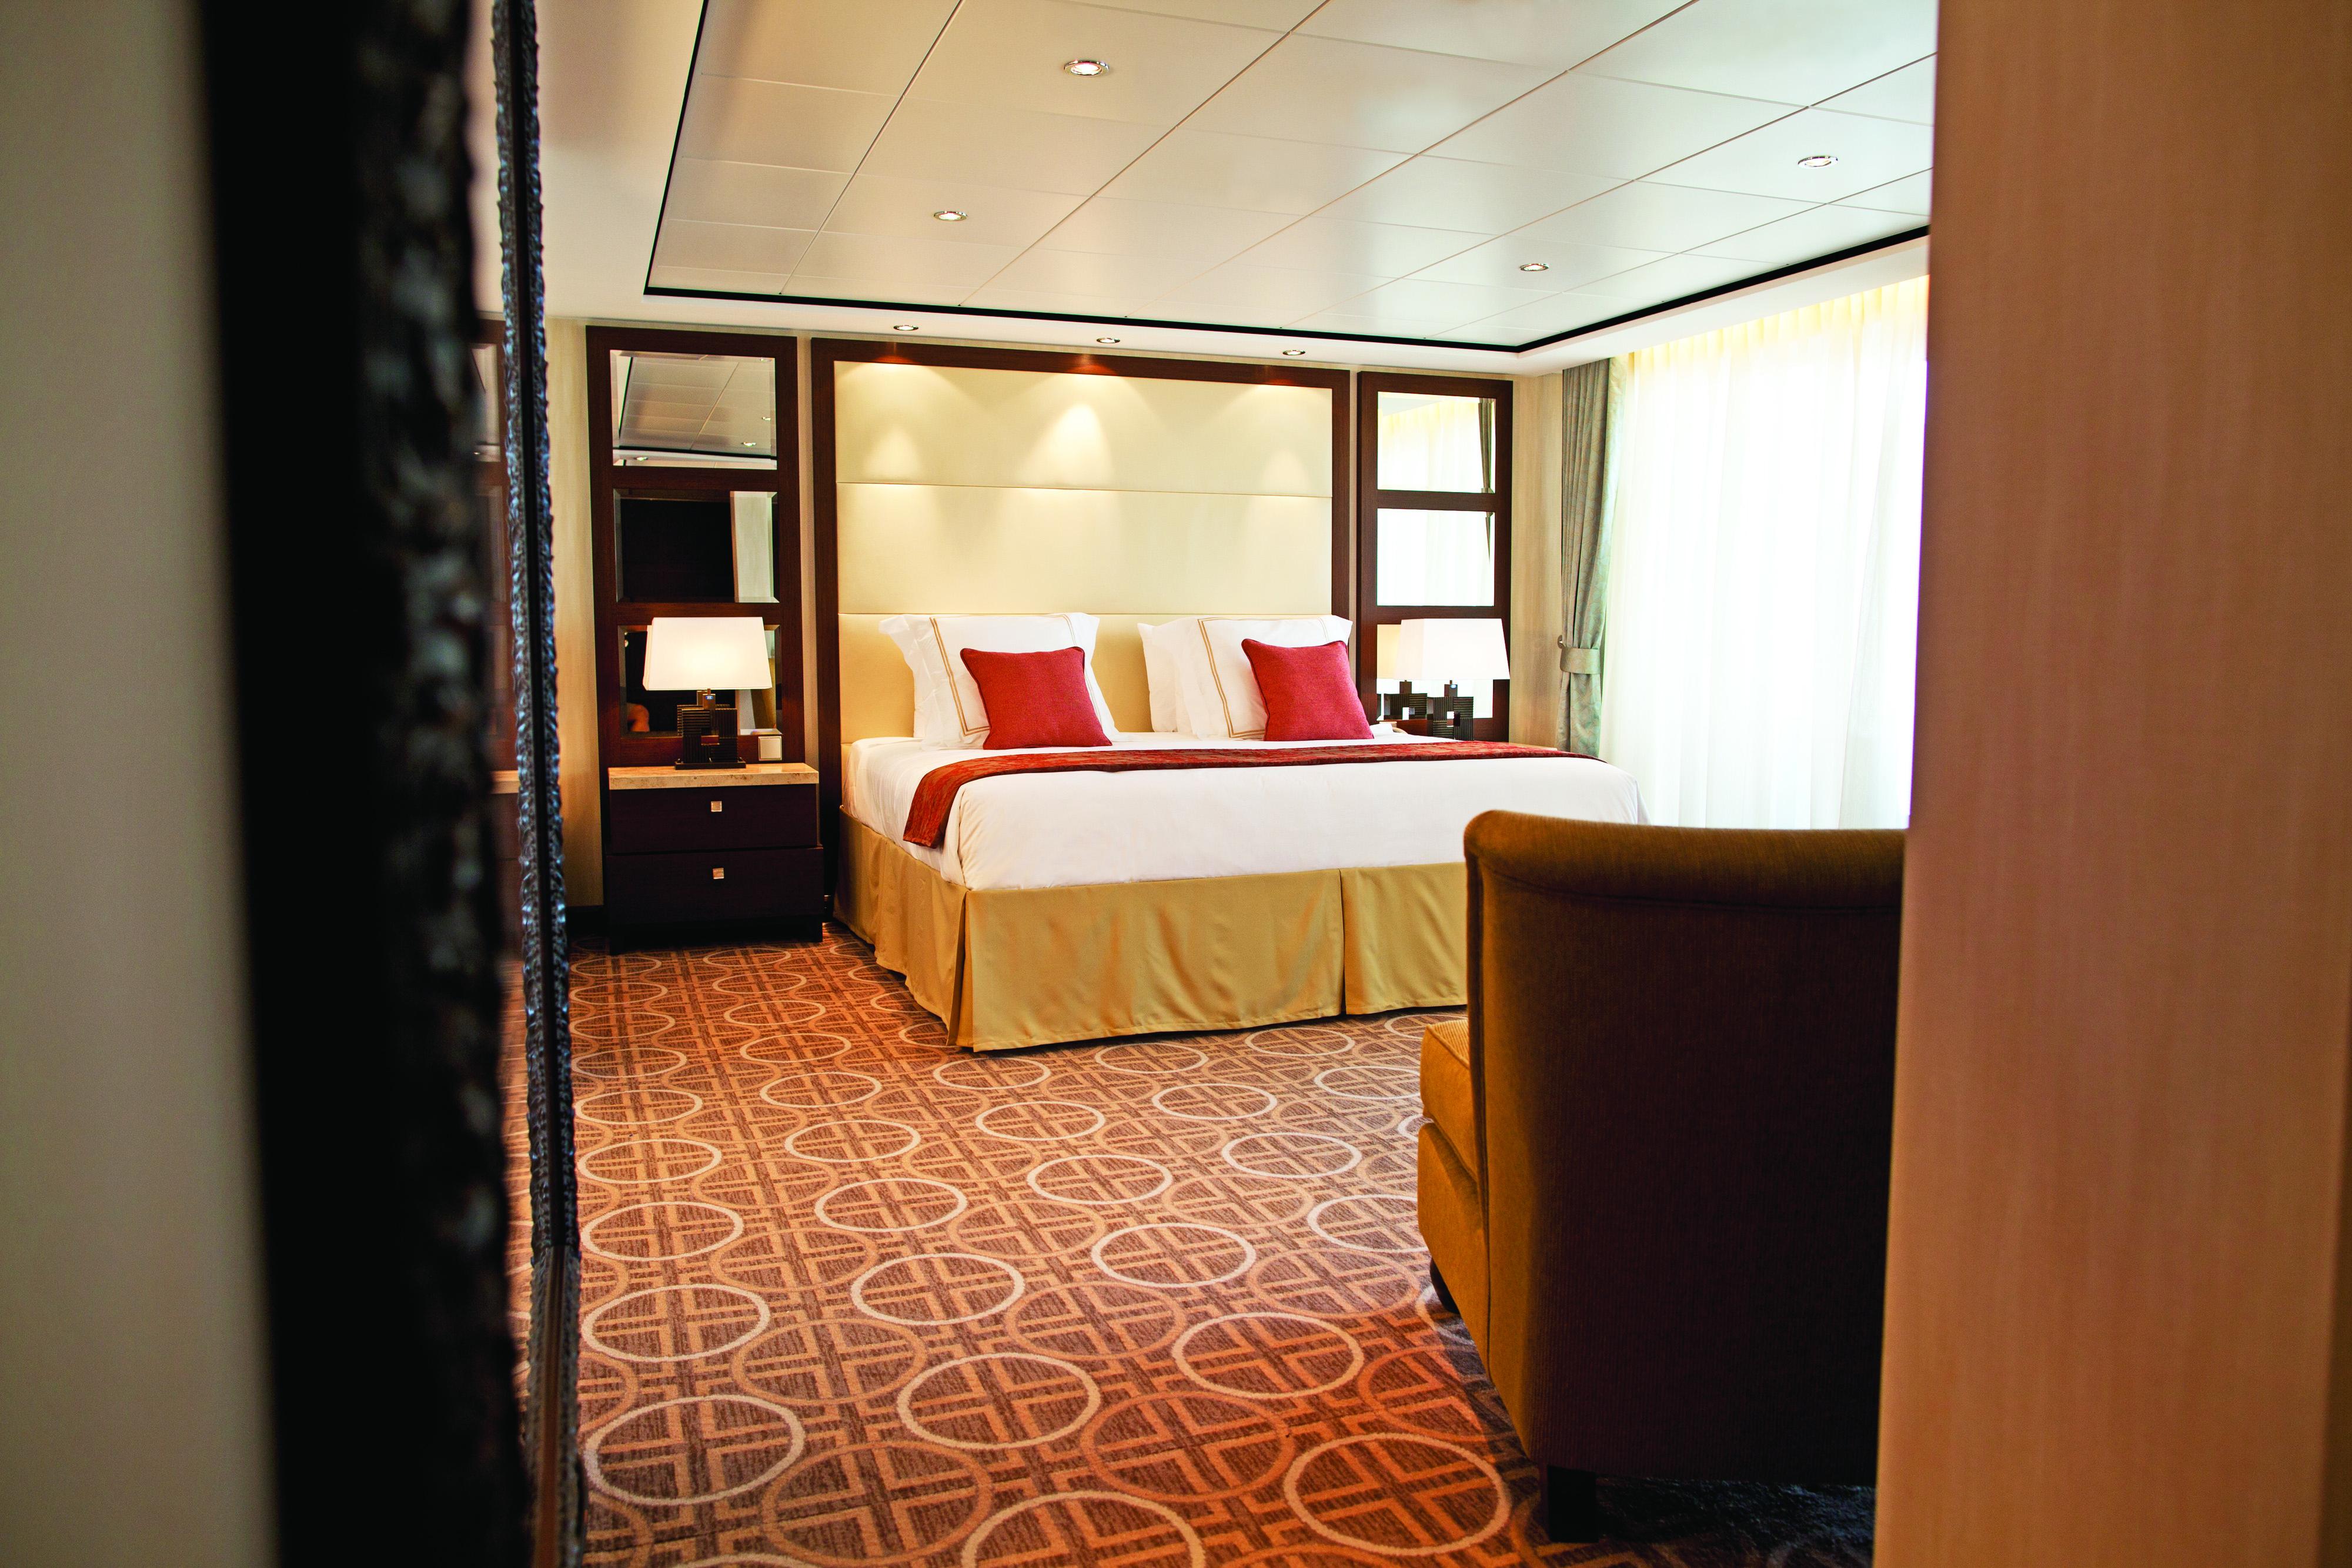 Celebrity Cruises Celebrity Solstice Accommodation Penthouse Bedroom.jpg